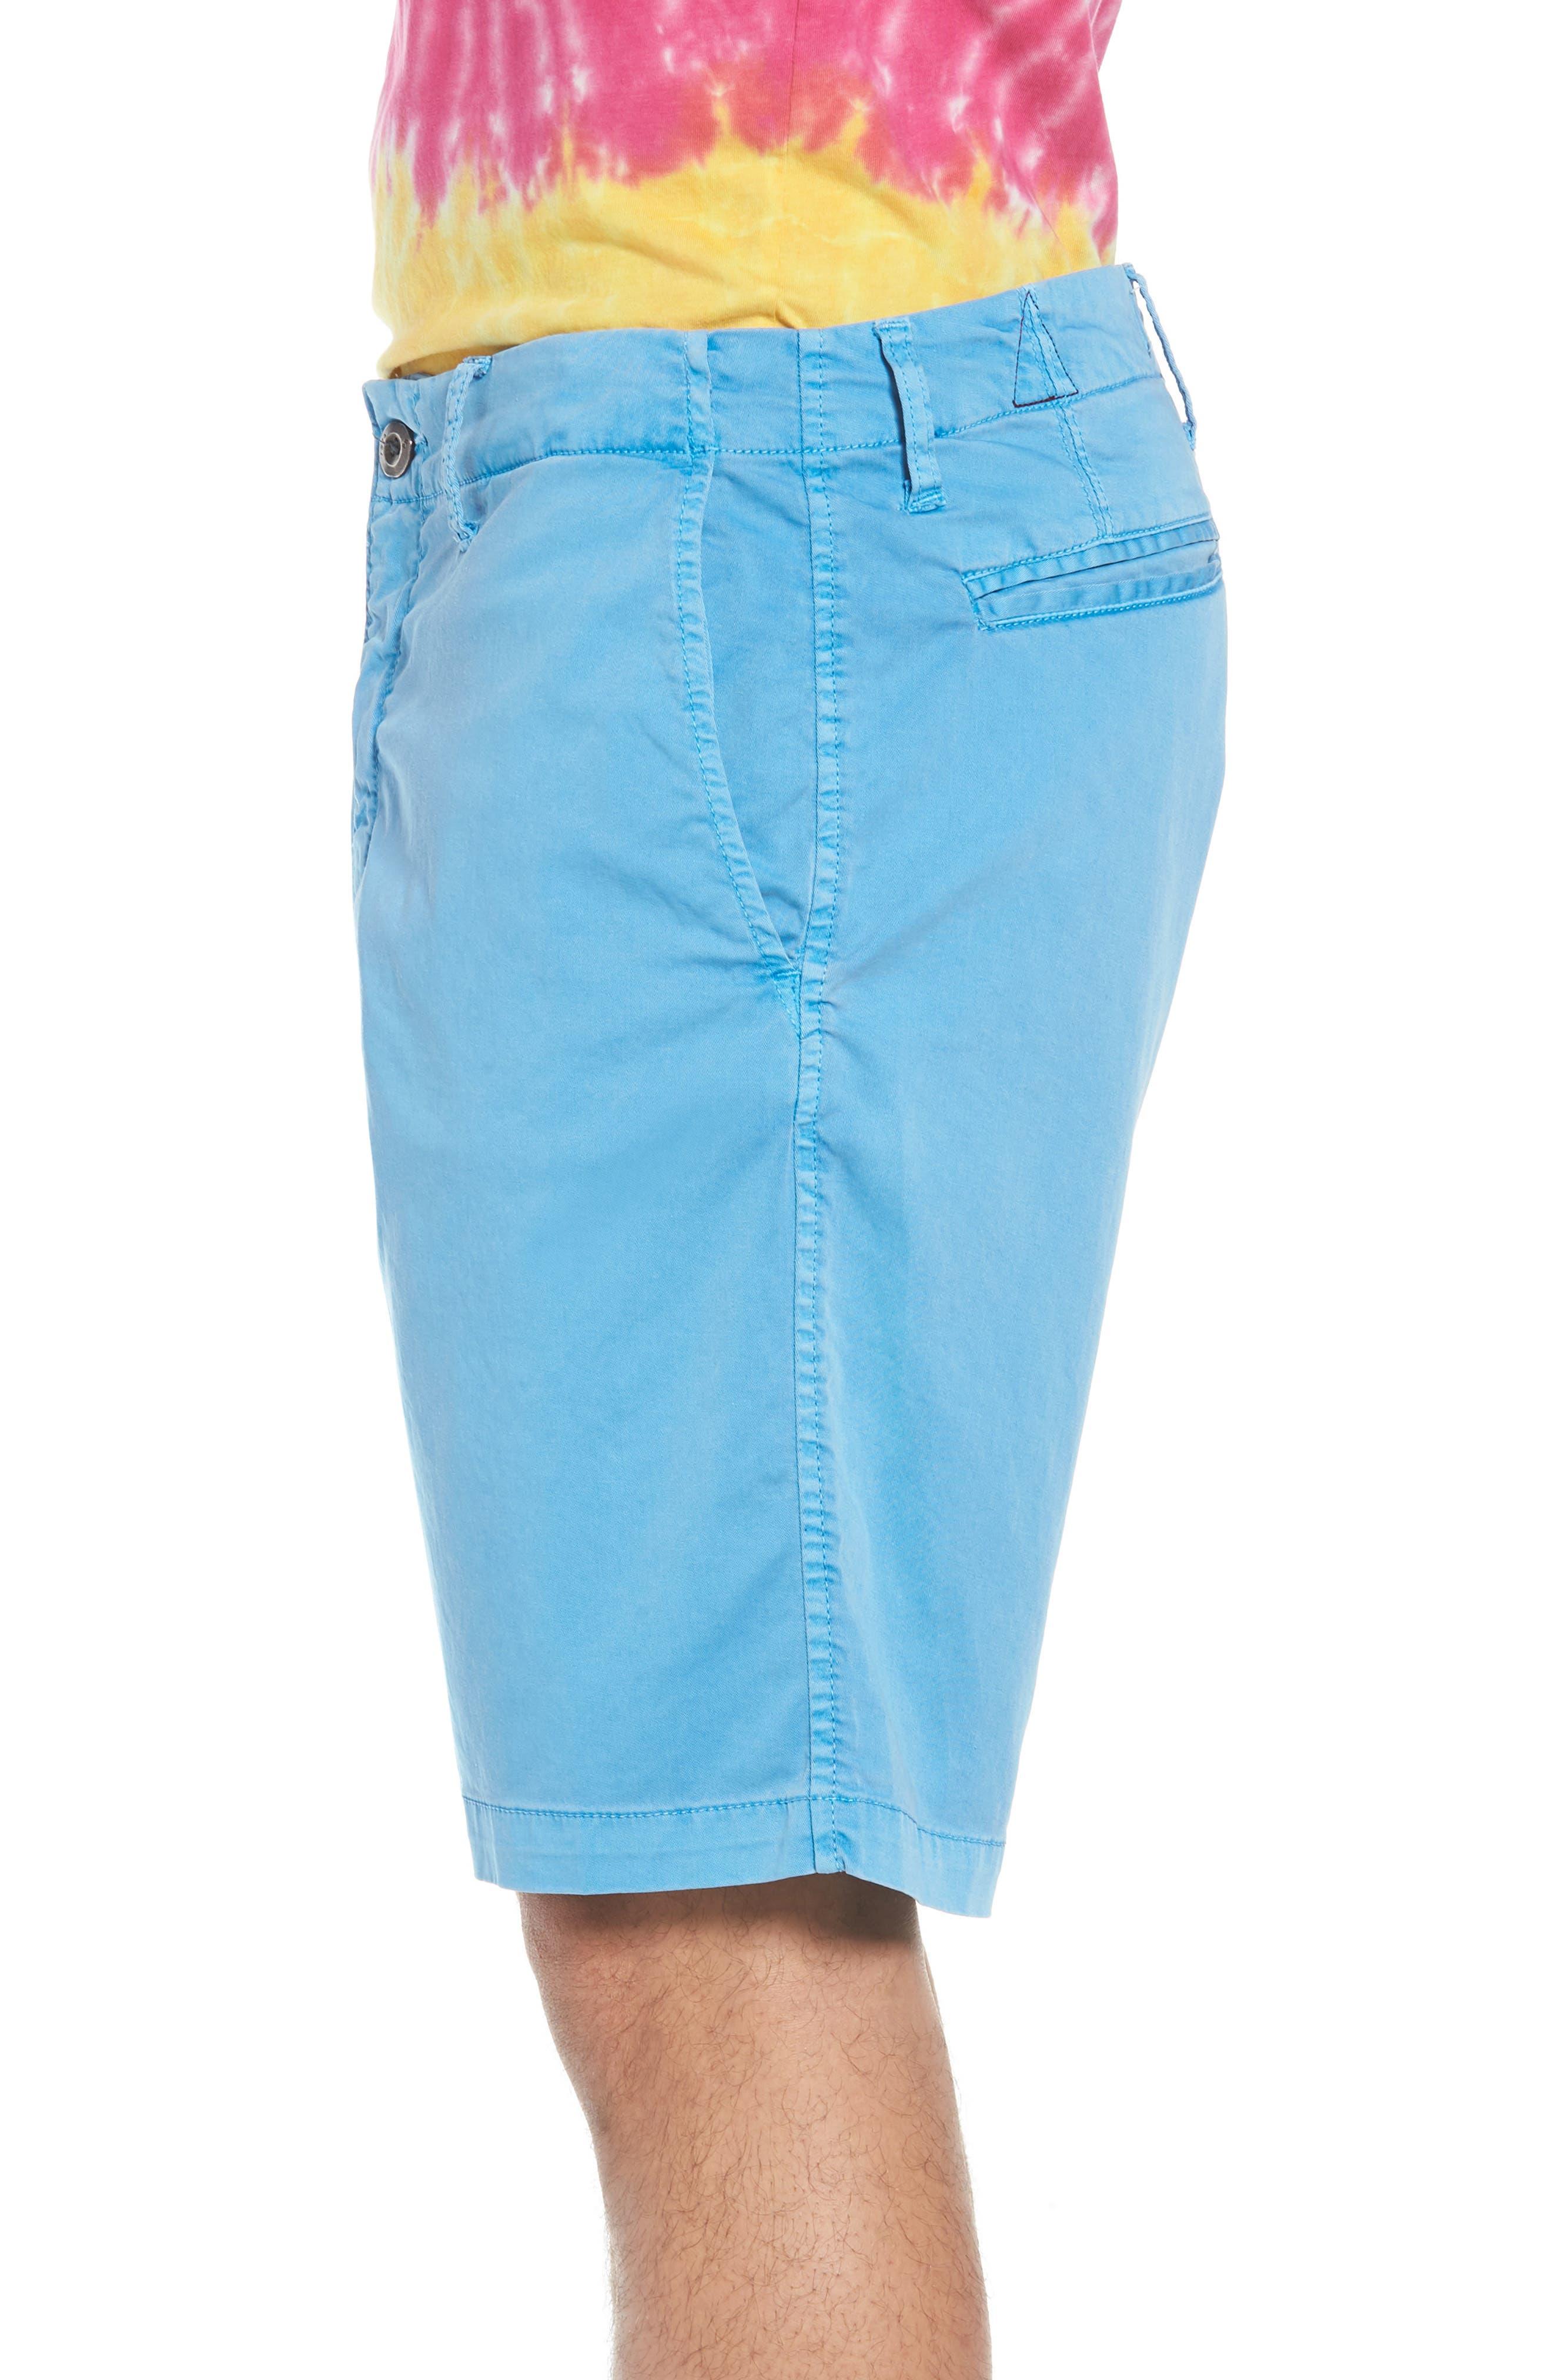 St. Barts Twill Shorts,                             Alternate thumbnail 32, color,